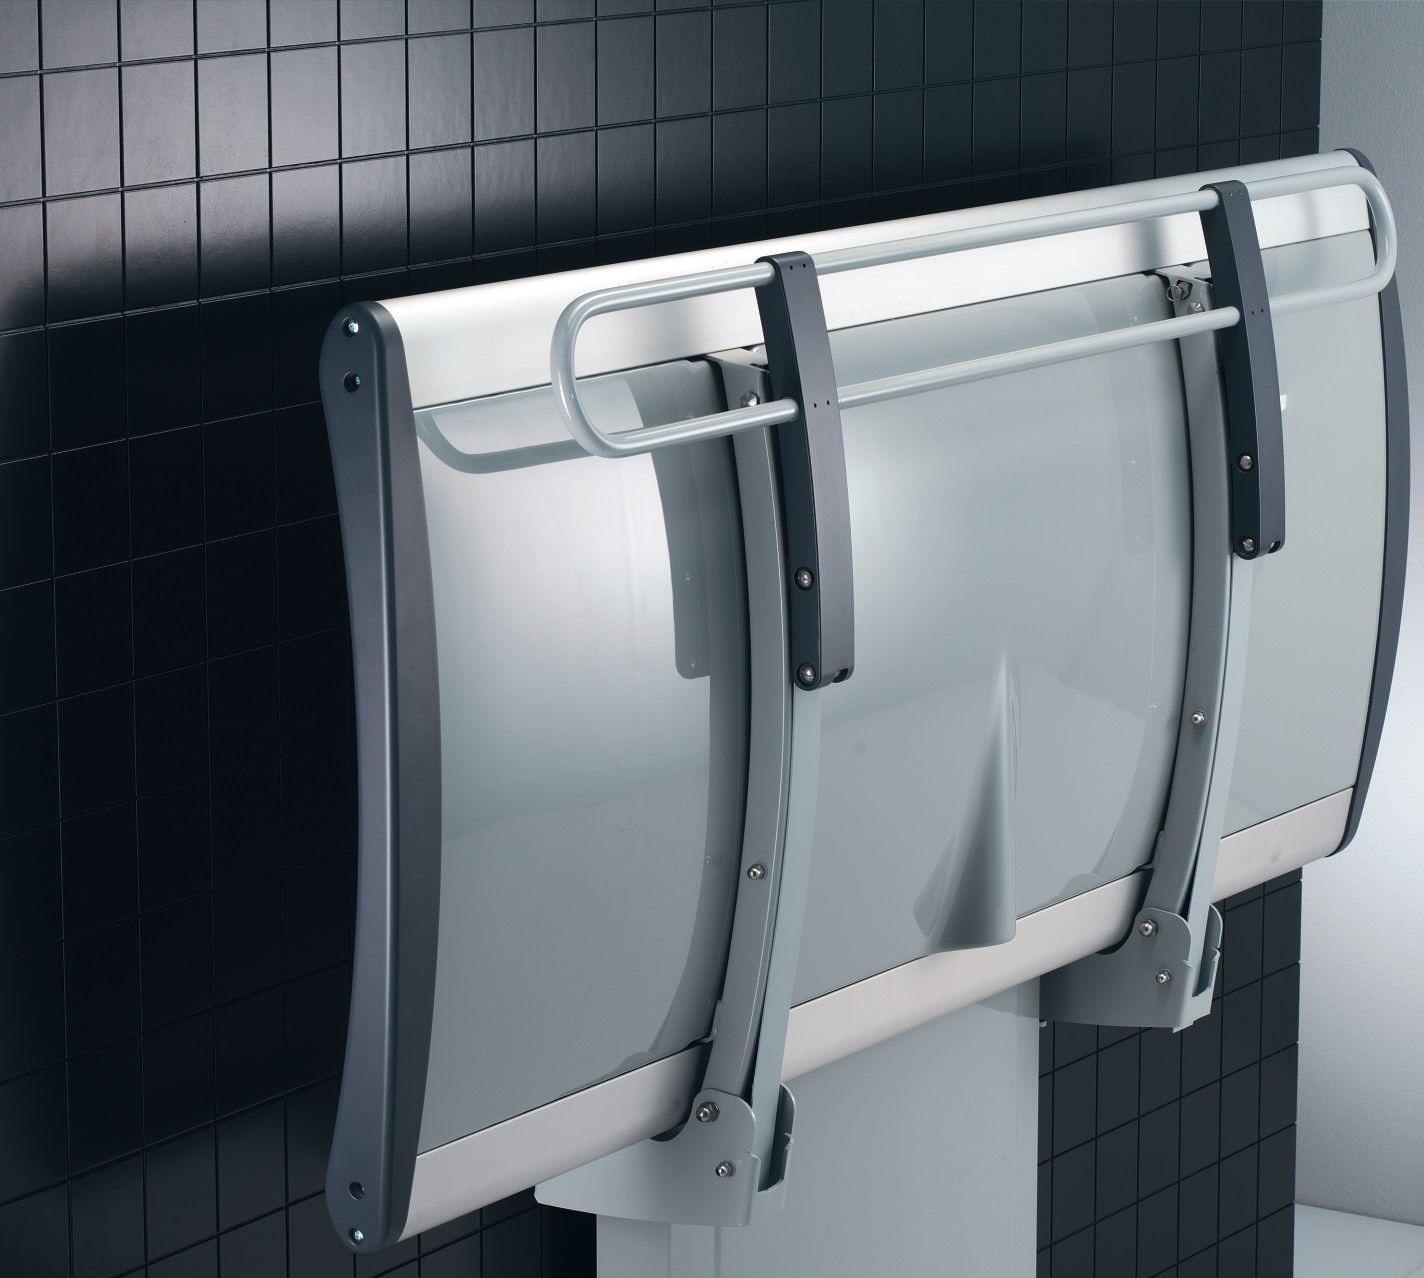 Pressalit Changing Bench Folded | Wet room ideas | Pinterest | Bench ...